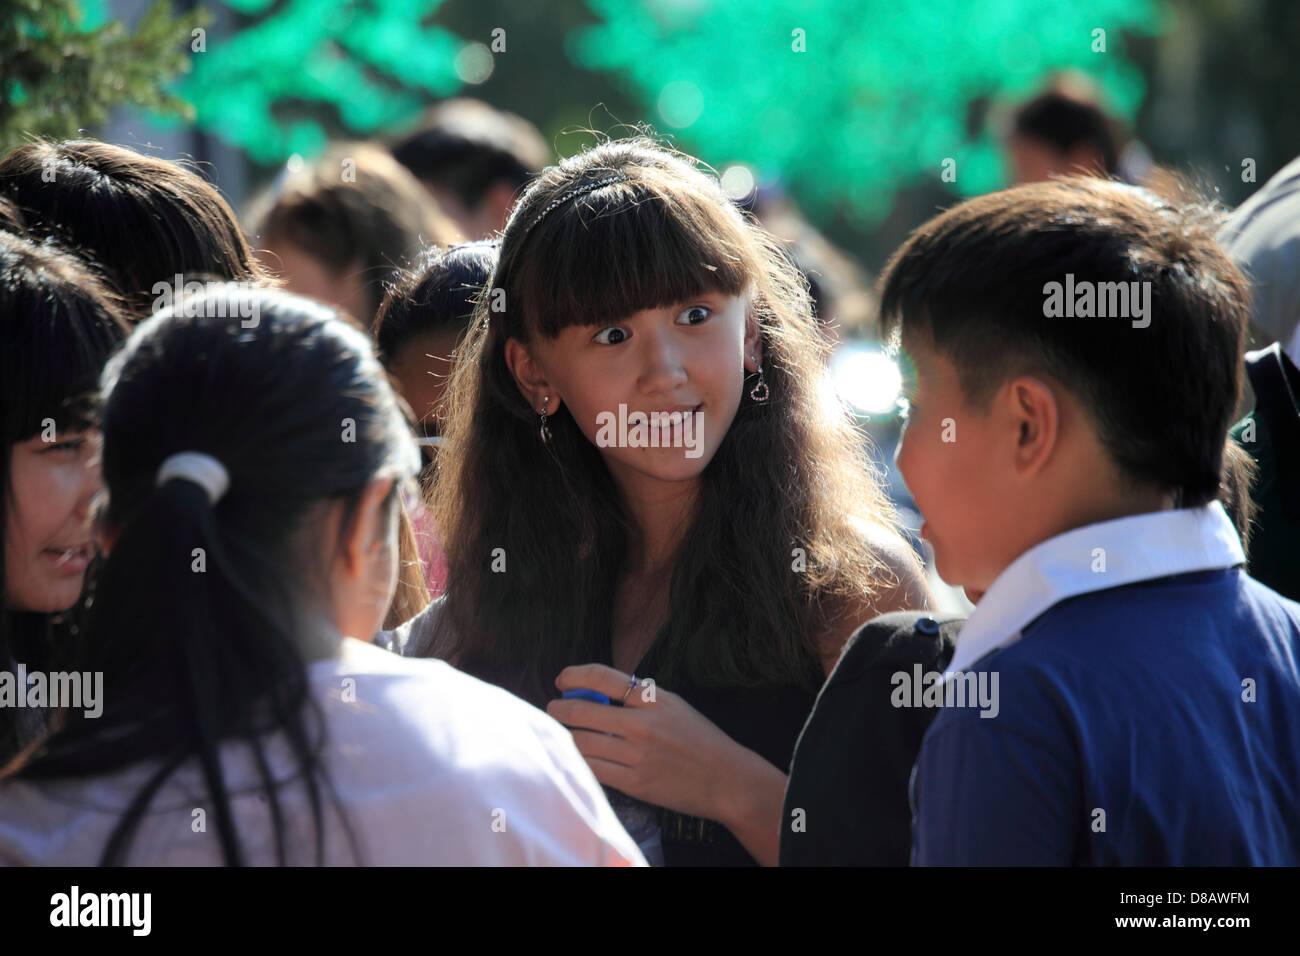 Astana - meeting of teen-agers - Stock Image